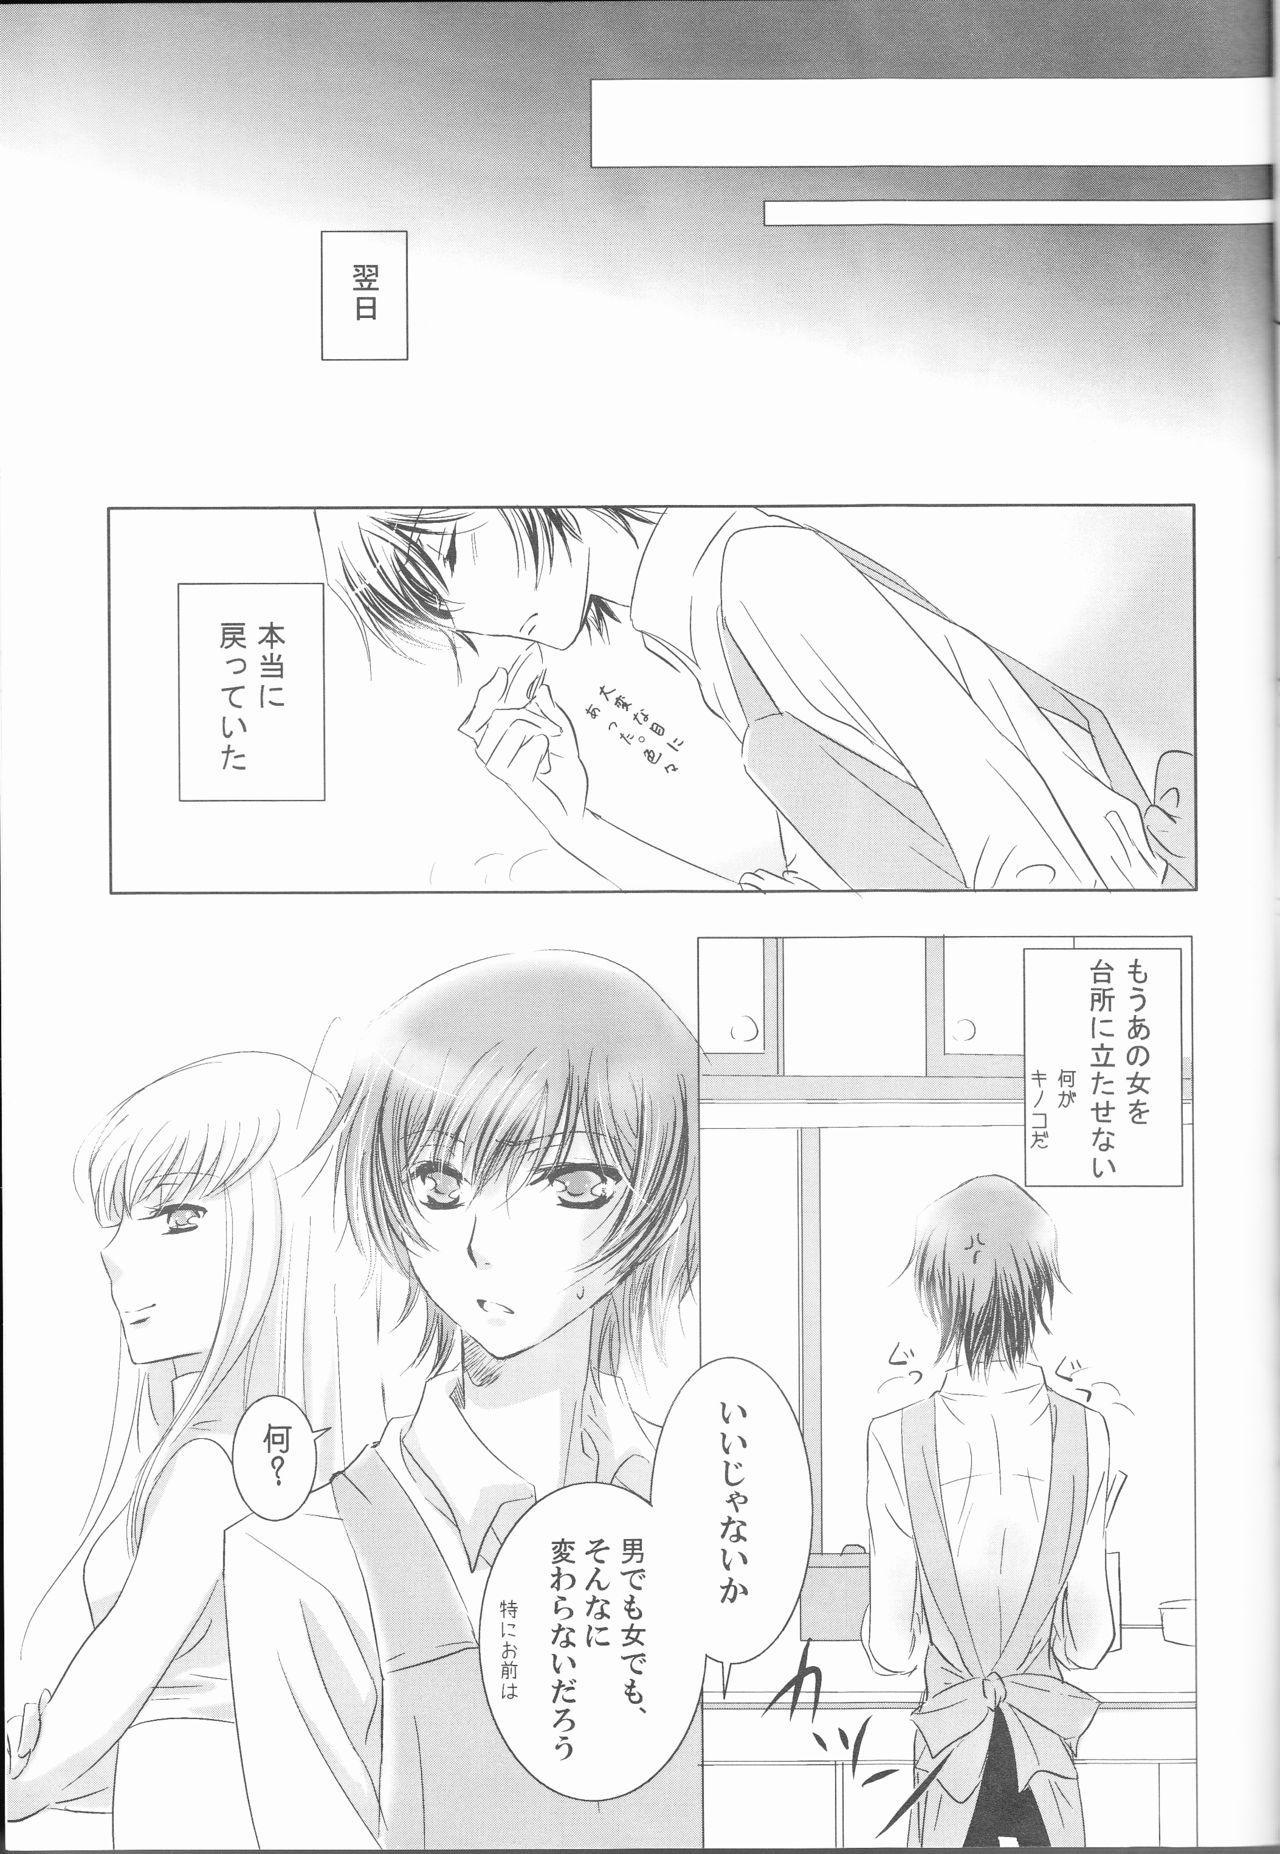 Mitaiken Ryouiki 20